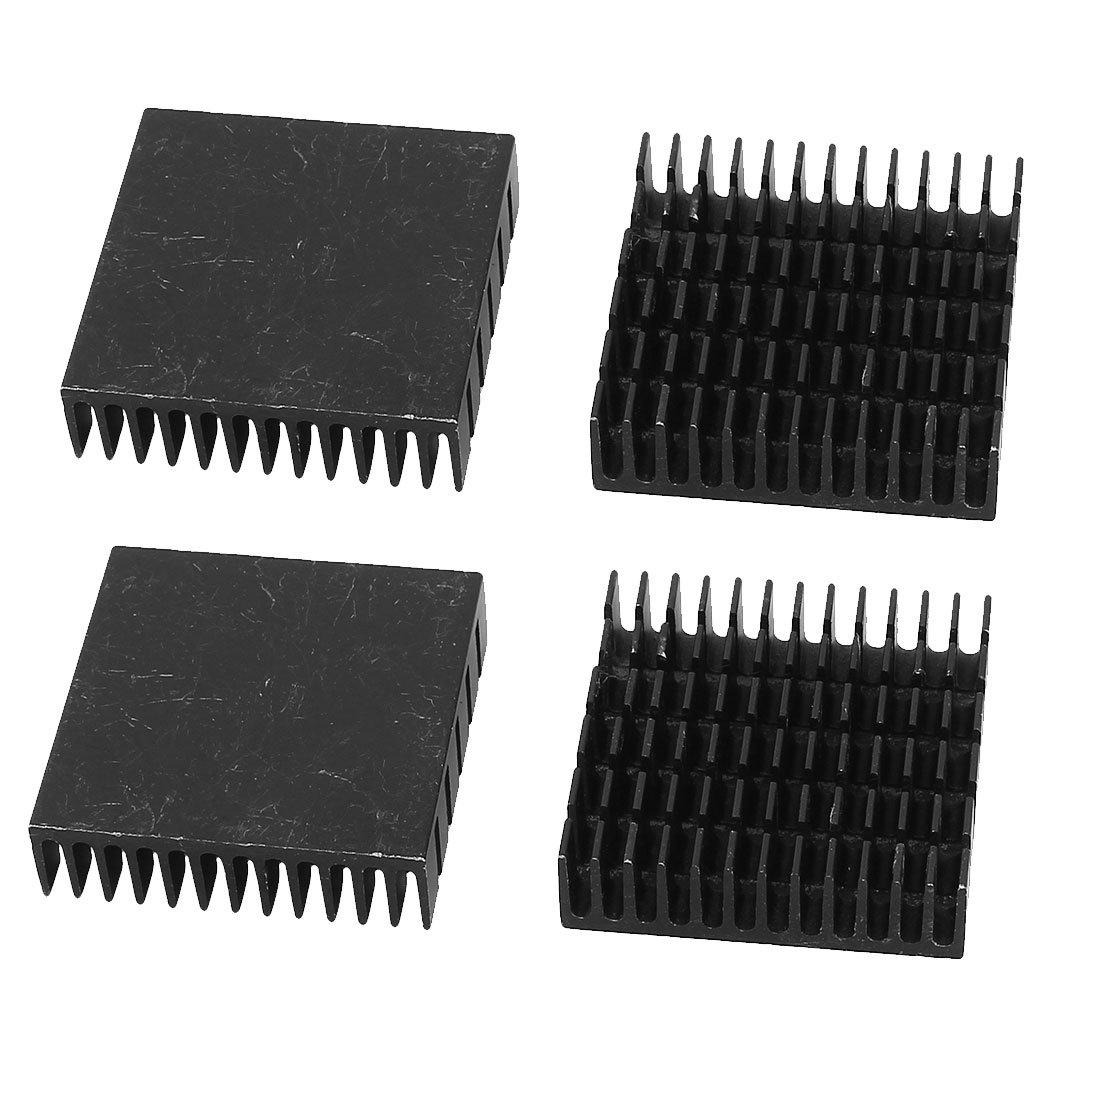 uxcell Aluminum Heatsink Radiator Heat Sink Cooling Cooler Fin 40mm x 40mm x 11mm 4 Pcs Black